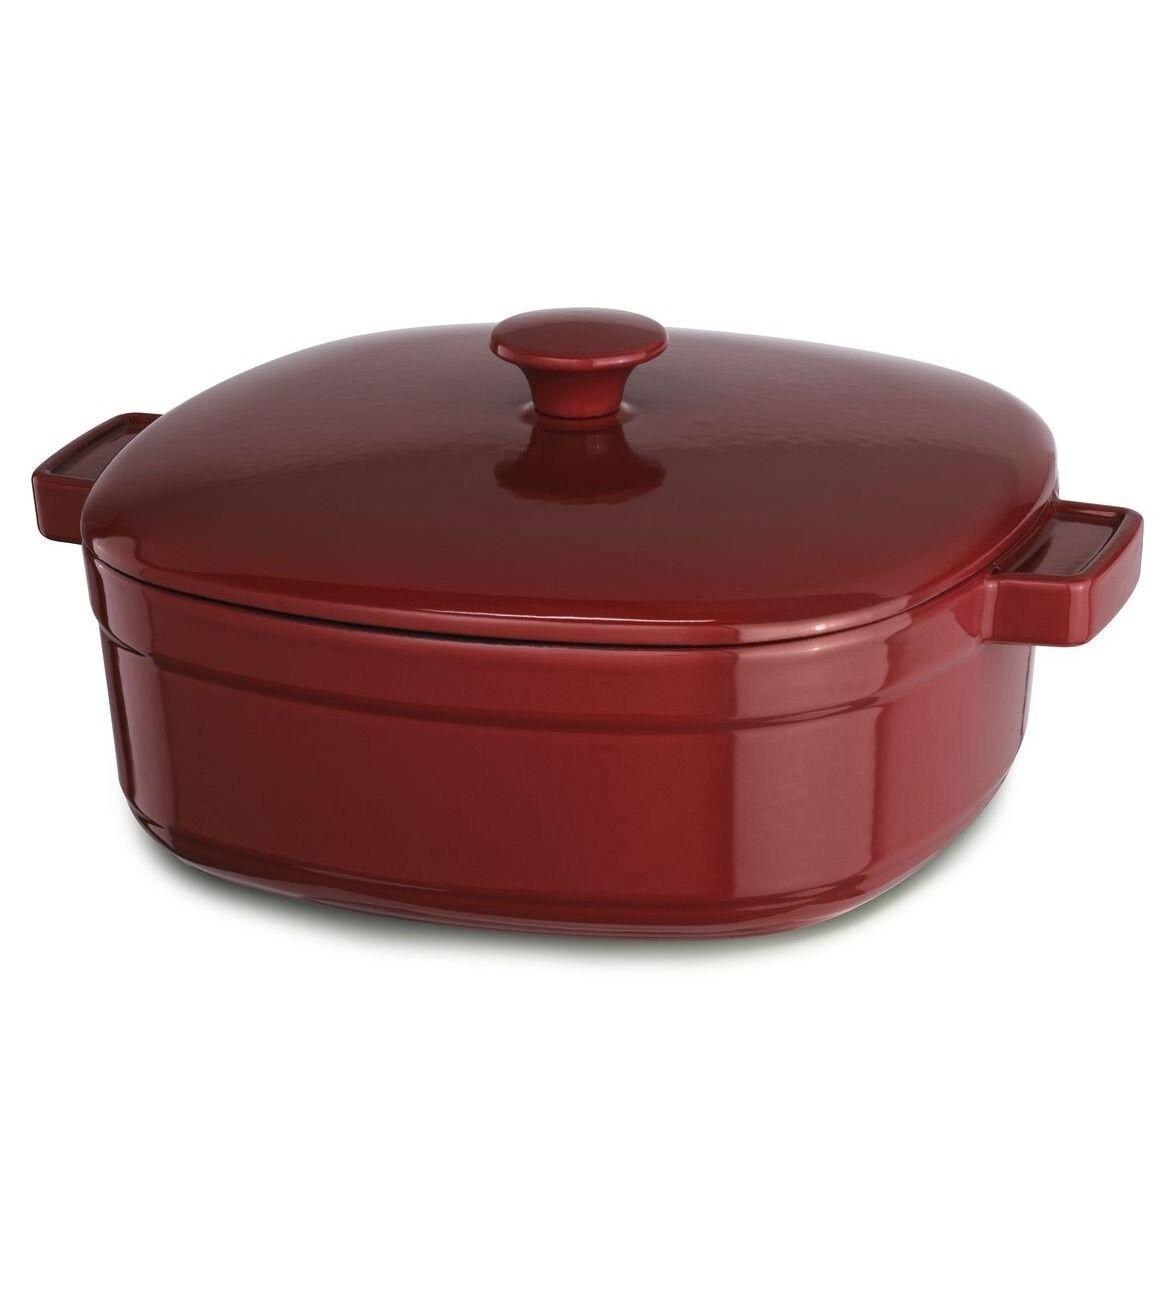 Kitchenaid Hierro Fundido optimizar utensilios de cocina kcli30crer Imperio Rojo 3-quart Cazuela